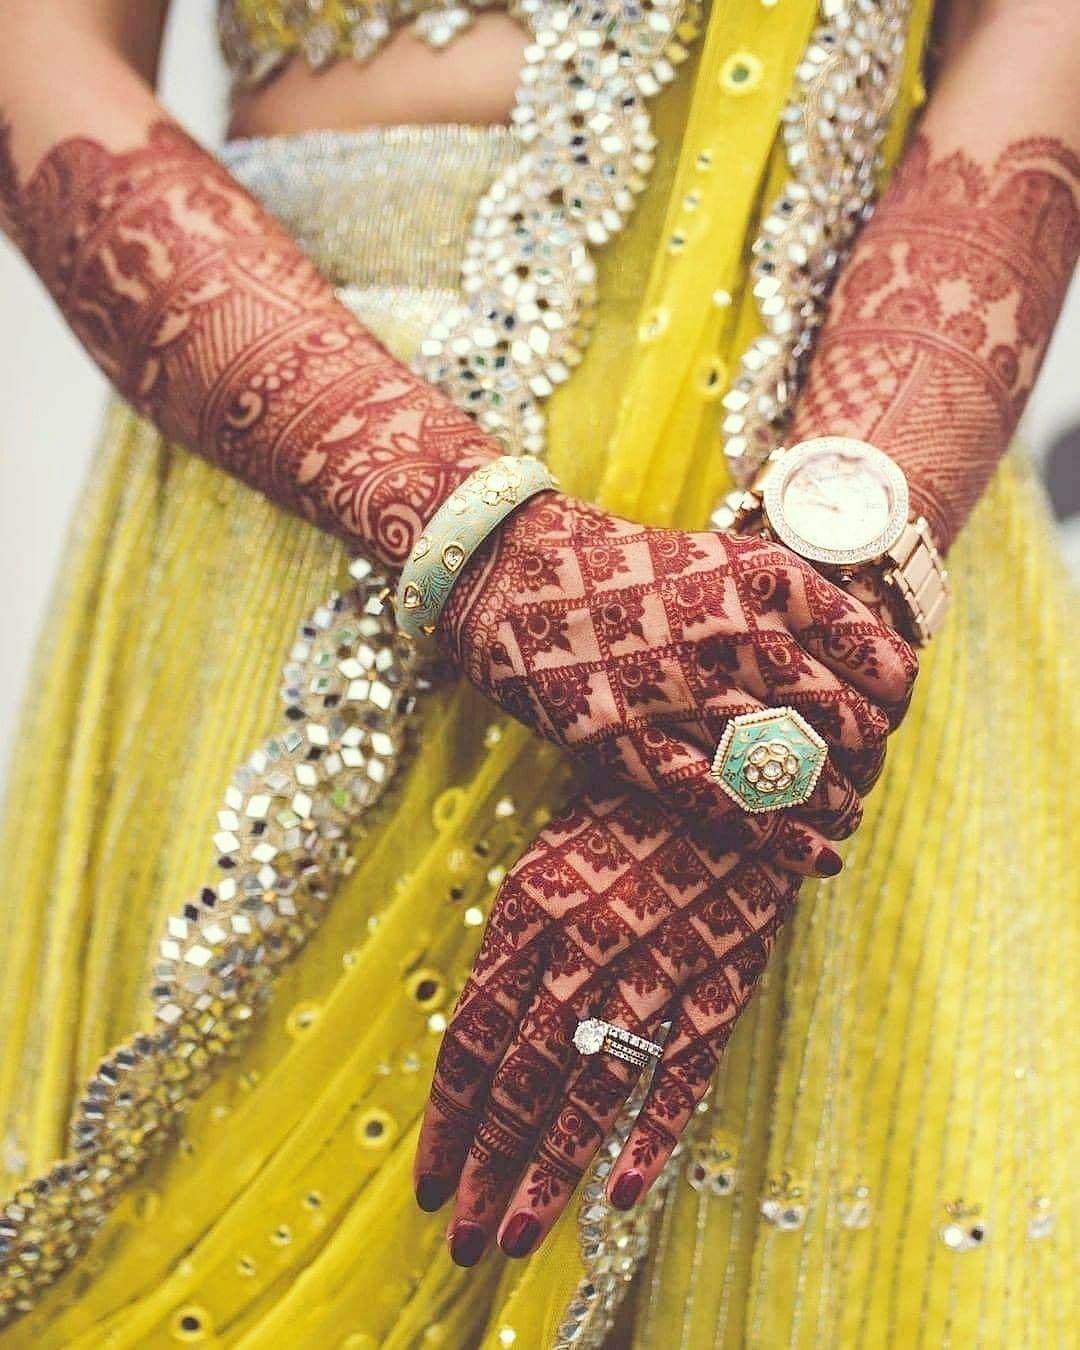 #love #choora #wedding #photography #marriages #indian #tradition #life #ideas #happiness #mehandi #bridalmehandi